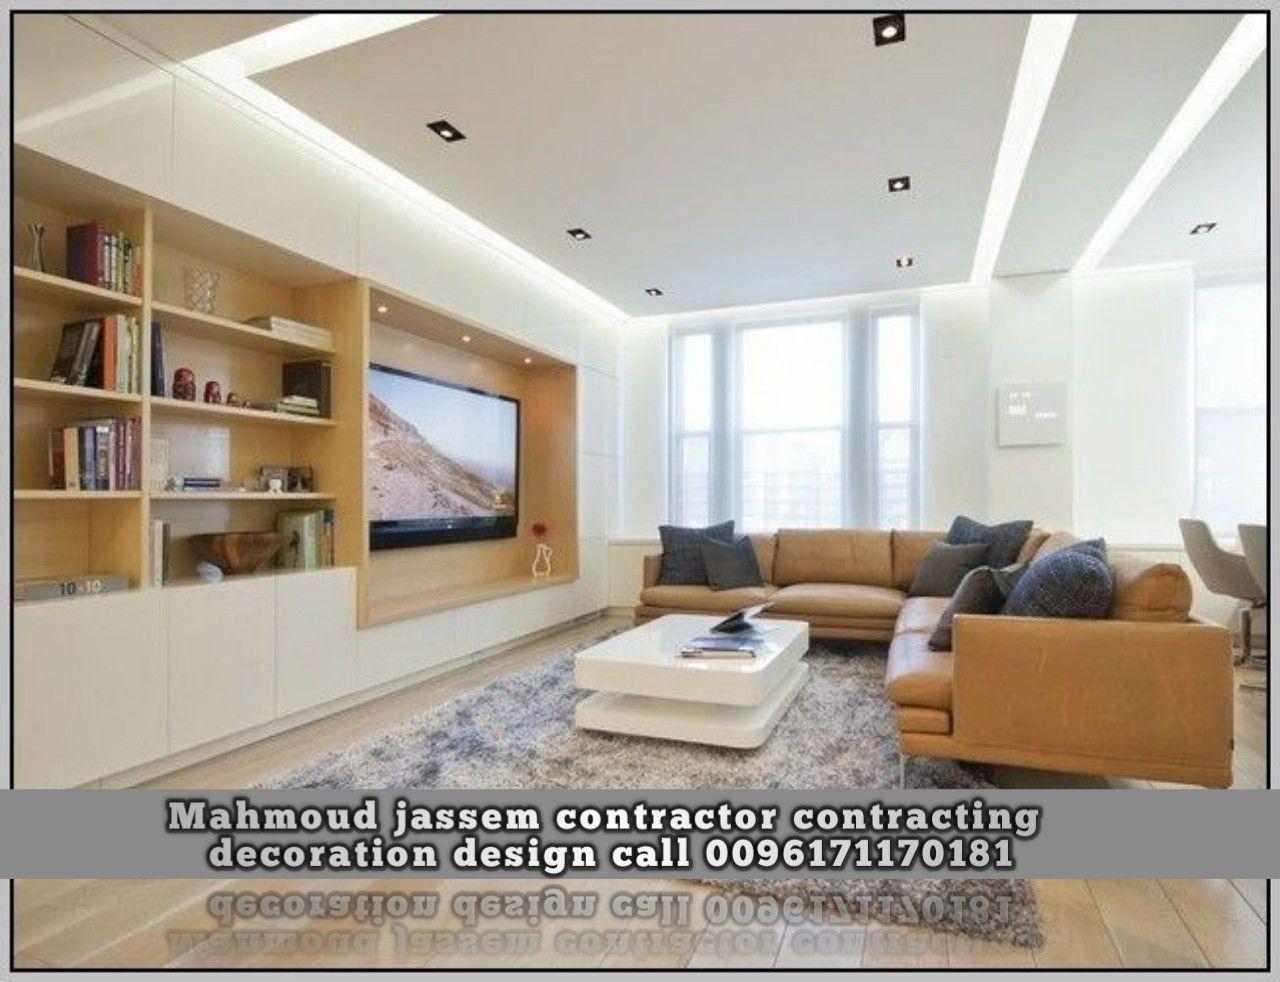 Home decorations and design beirut decor modern house gypsum wood paint designer glass walls wallpaper pourd ceiling will also rh pinterest